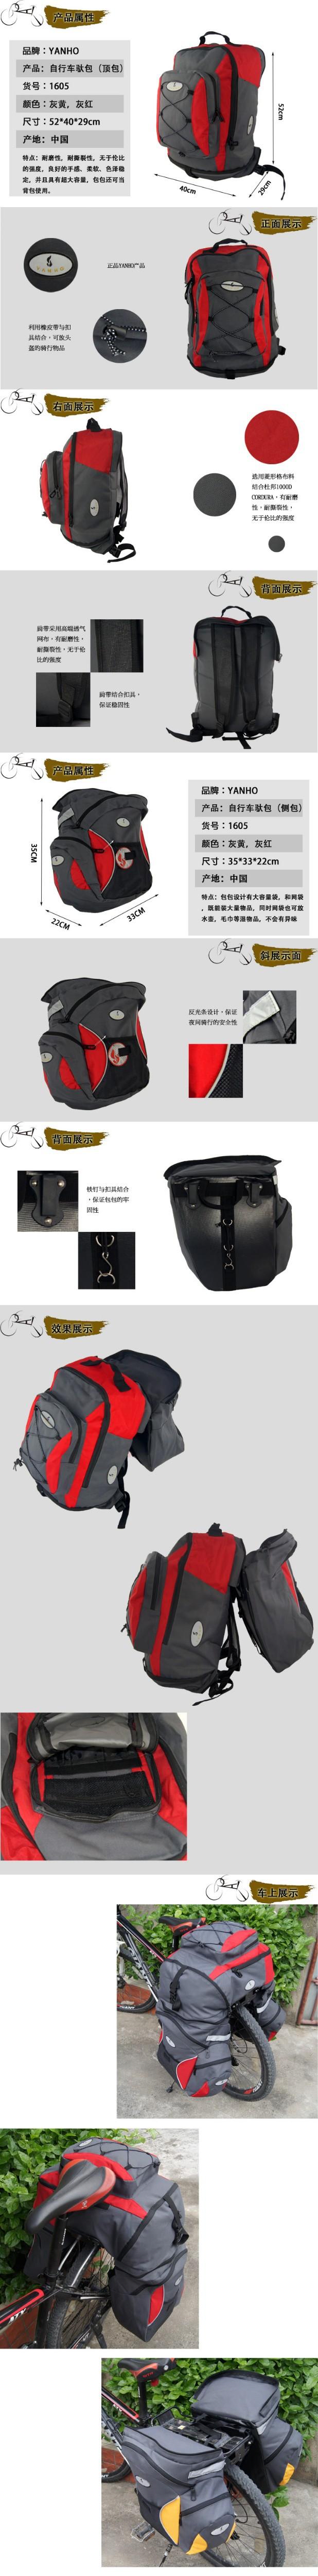 Top New Cycling Bicycle Accessories Waterproof Saddle Bag Duffle Bicycle Bag Rear Bike Pannier Bicycle Bags Cycling Bicycle Bag 60L 0